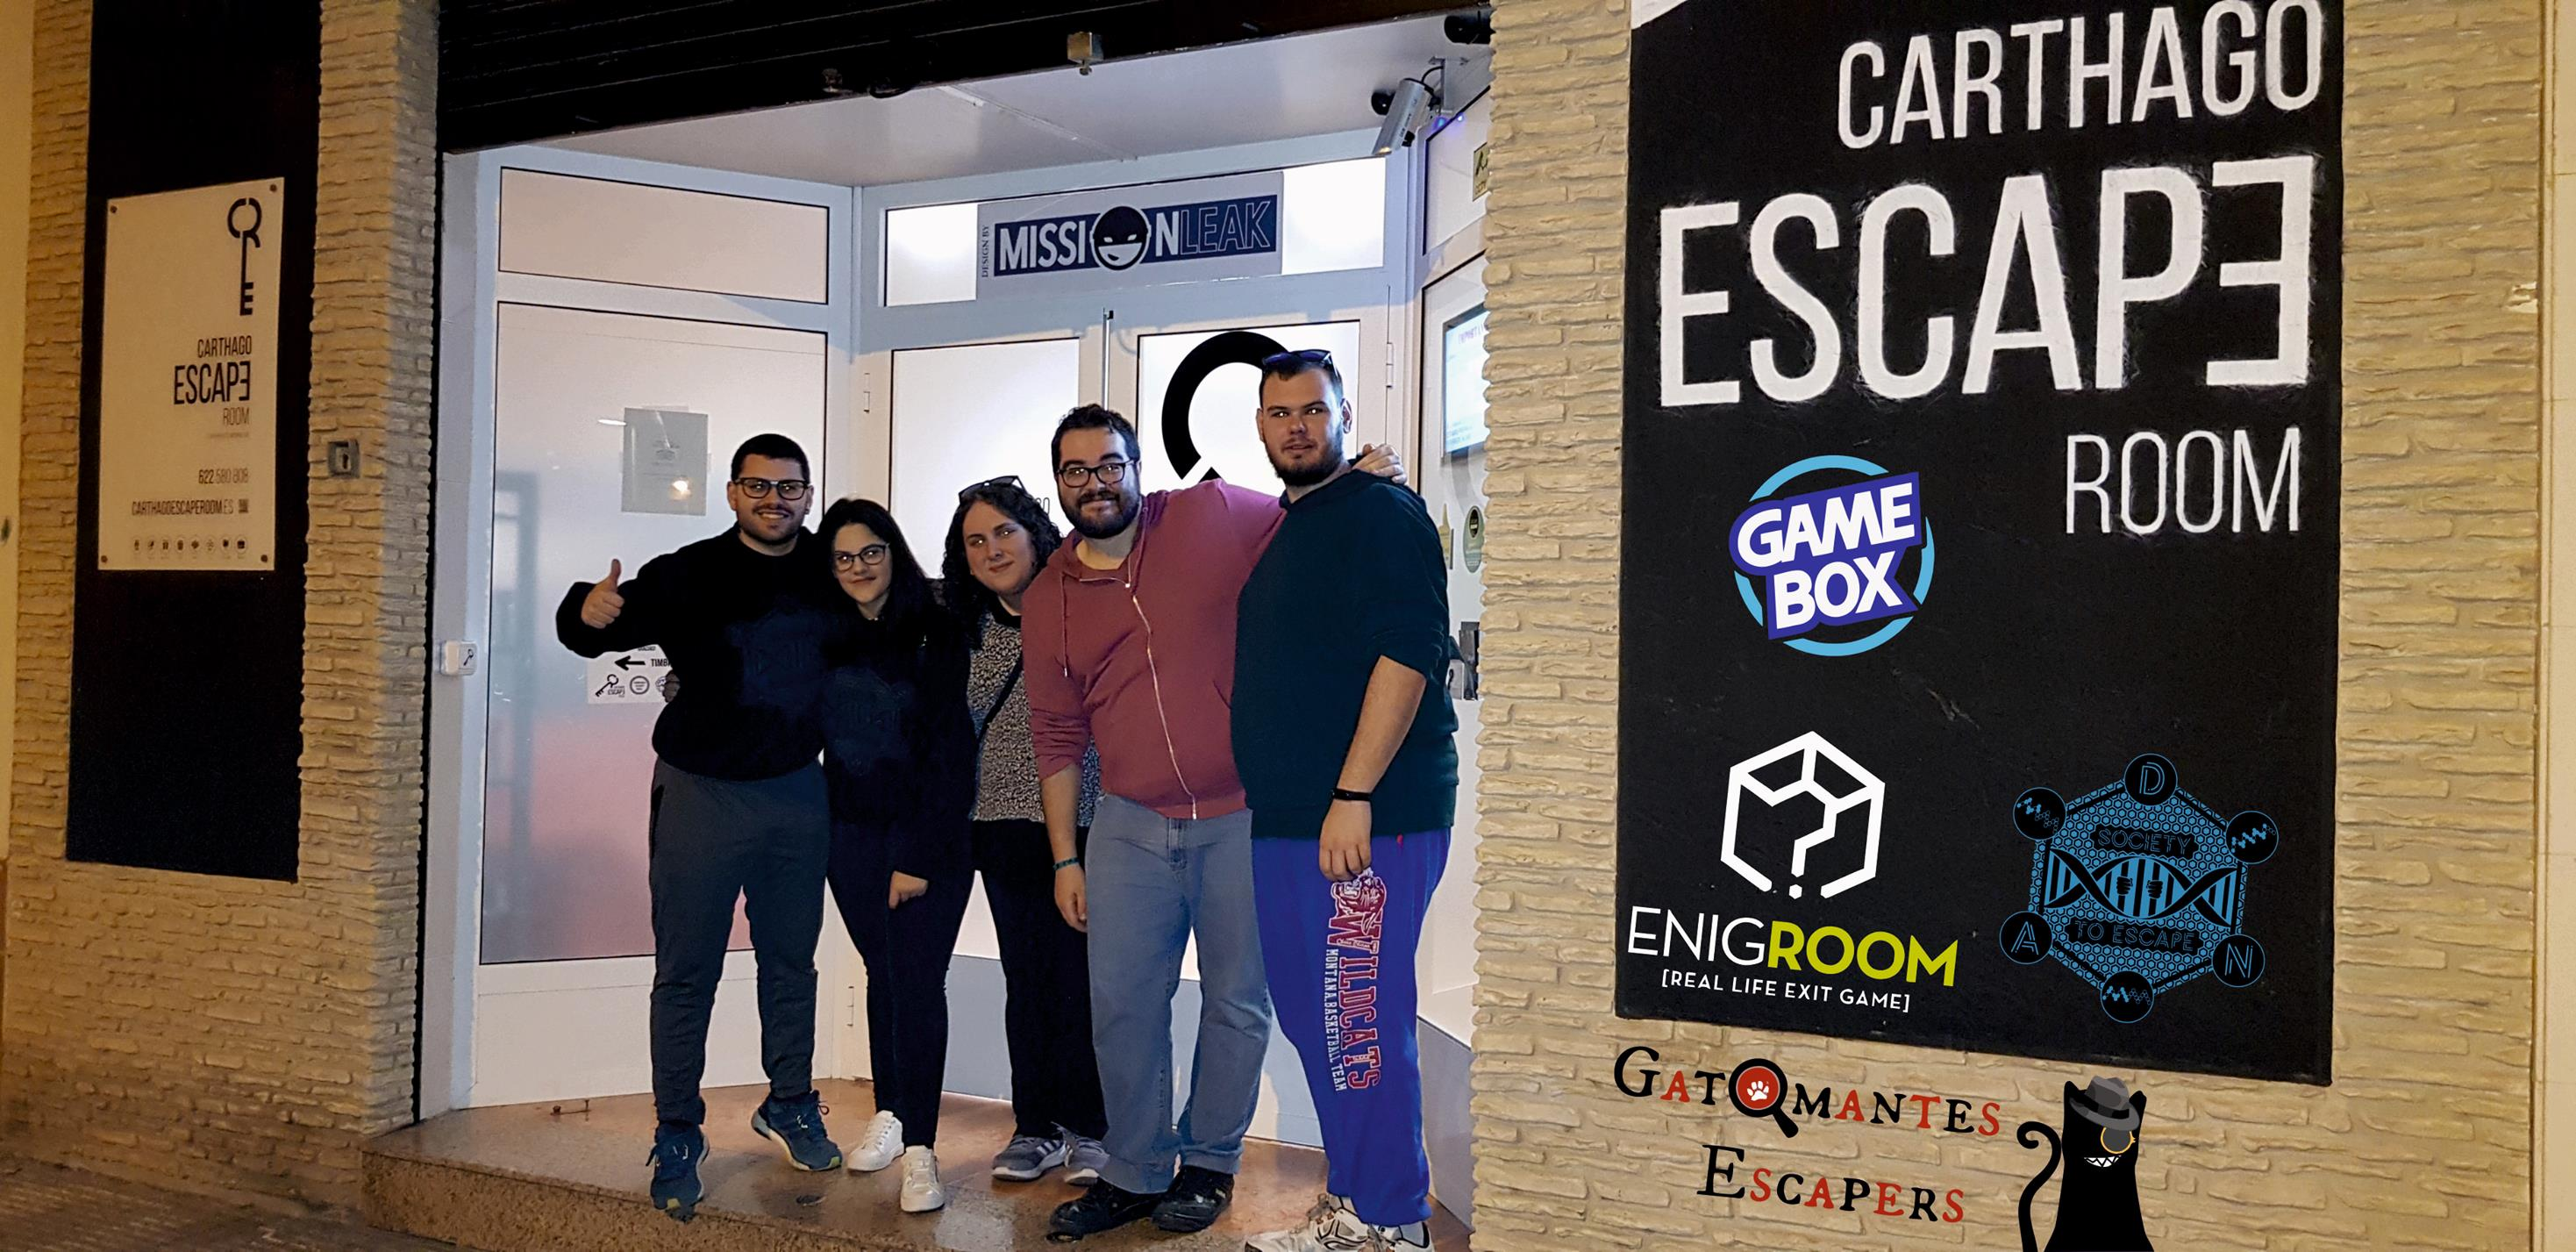 Game Box (Carthago Escape Room)